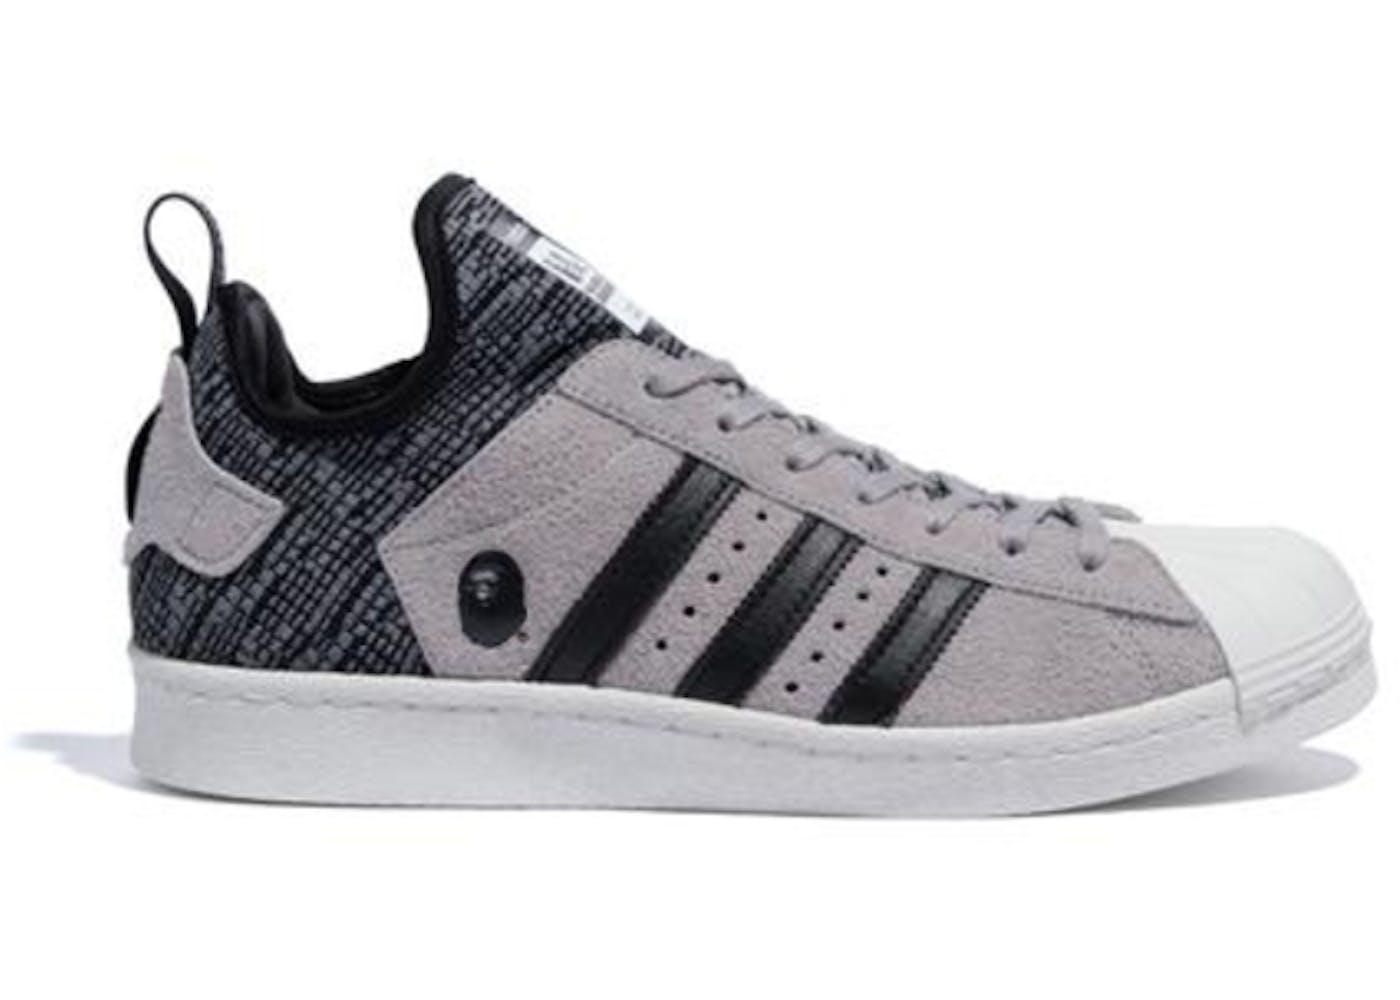 Cheap Superstar Black, Cheapest Adidas Superstar Black Shoes Sale